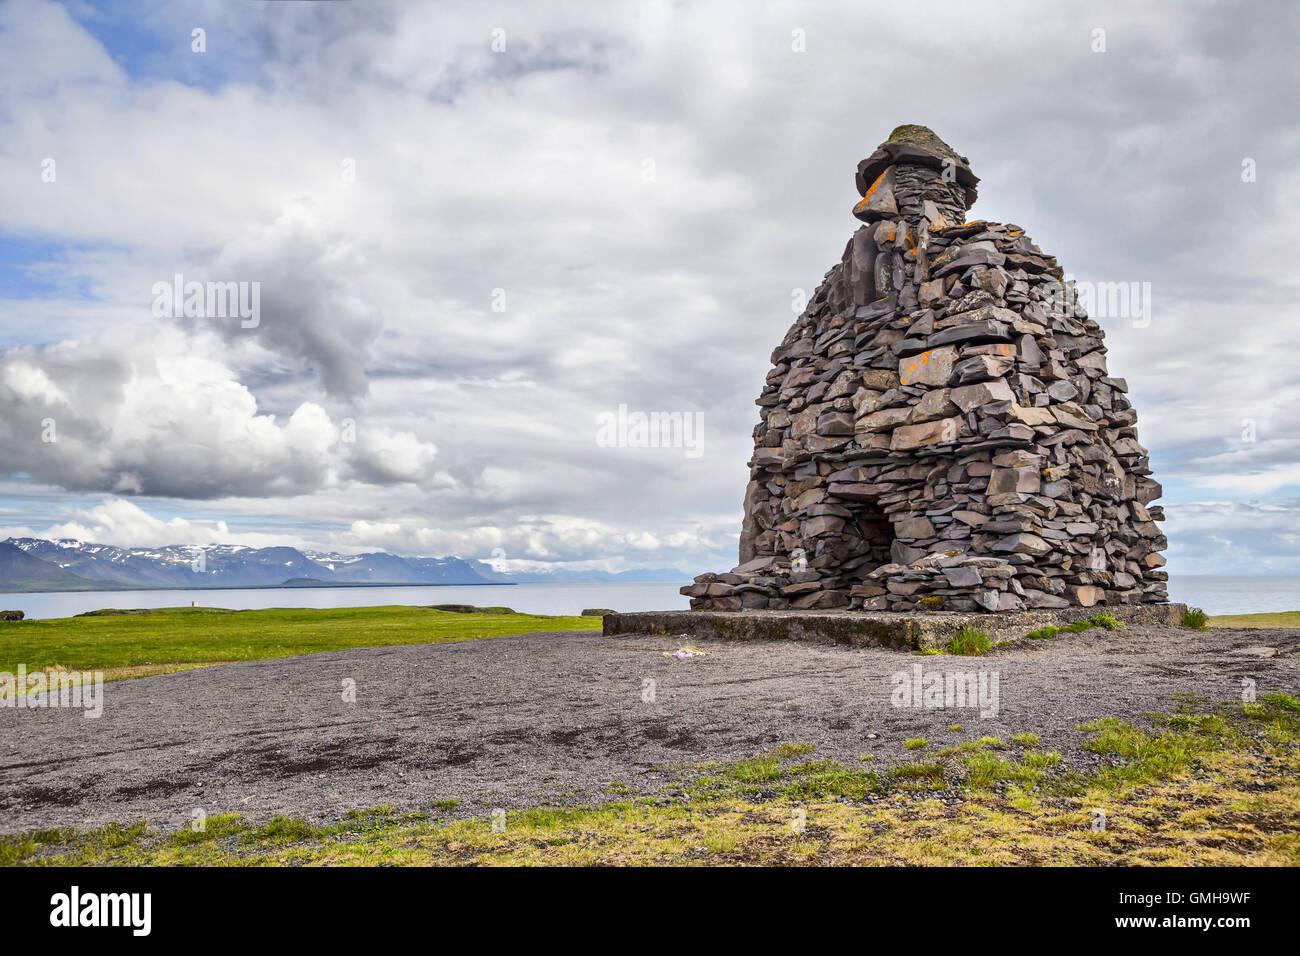 Bardar Saga Snaefellsnes Statue, west Iceland - Stock Image